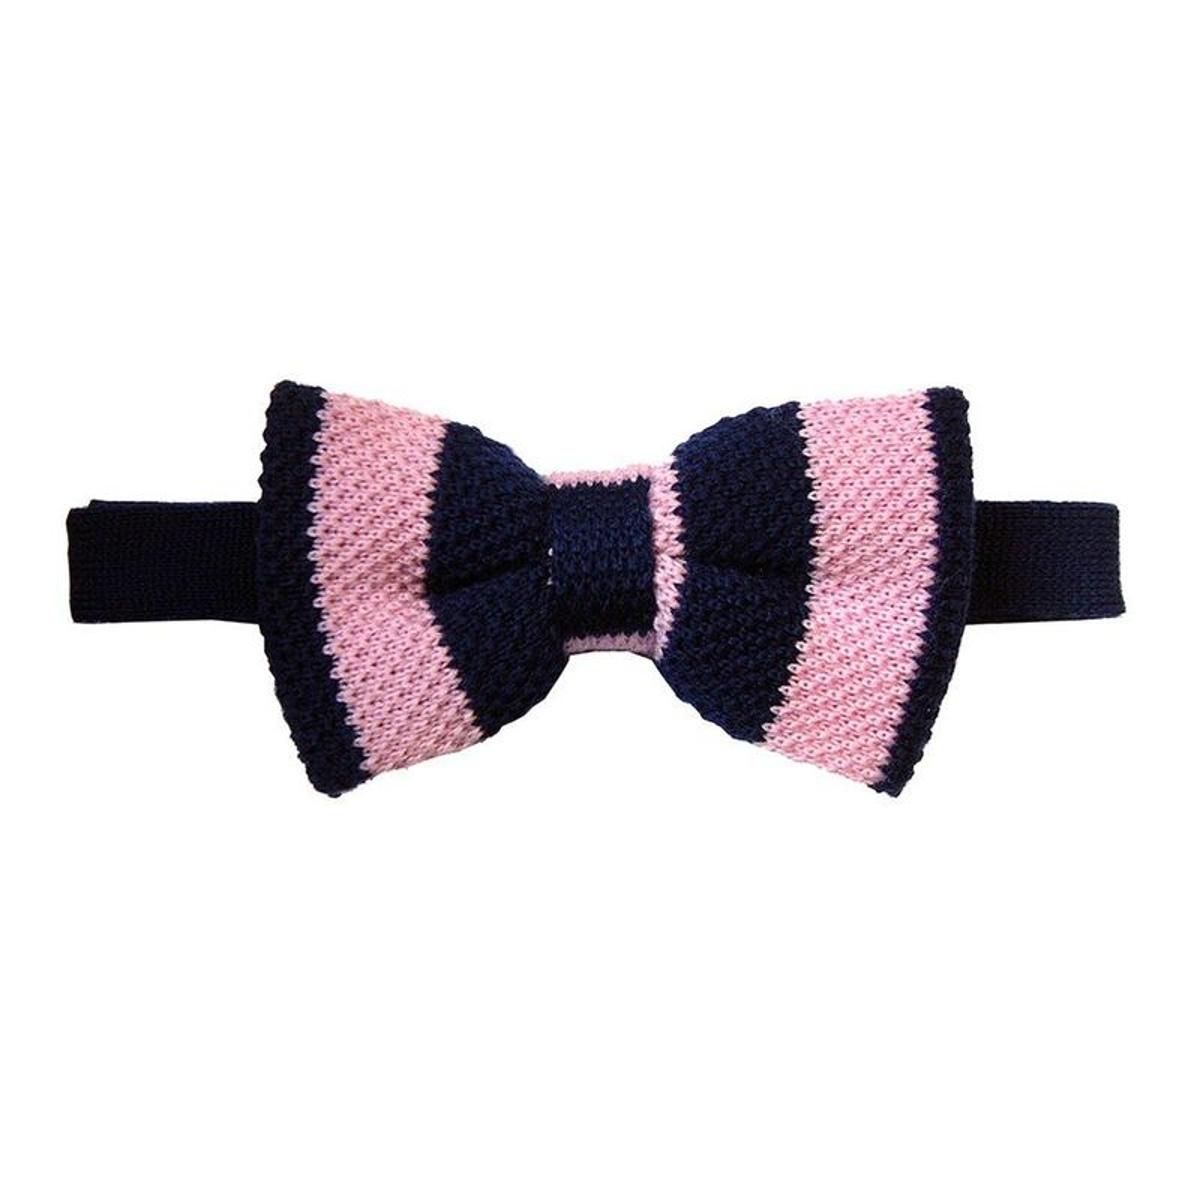 Noeud papillon tricot Gentleman club. Laine Club / rayé